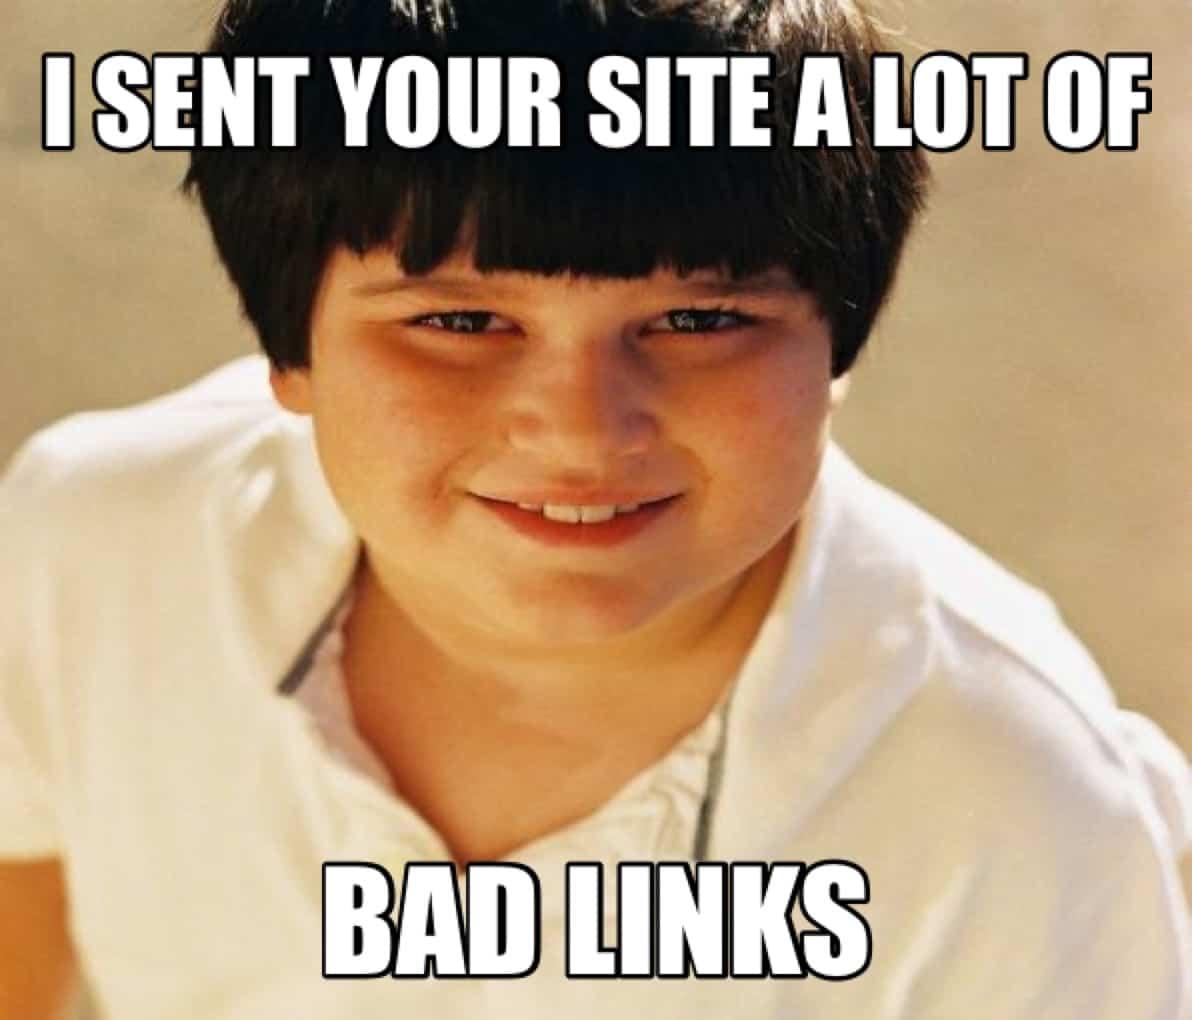 Negative SEO Links